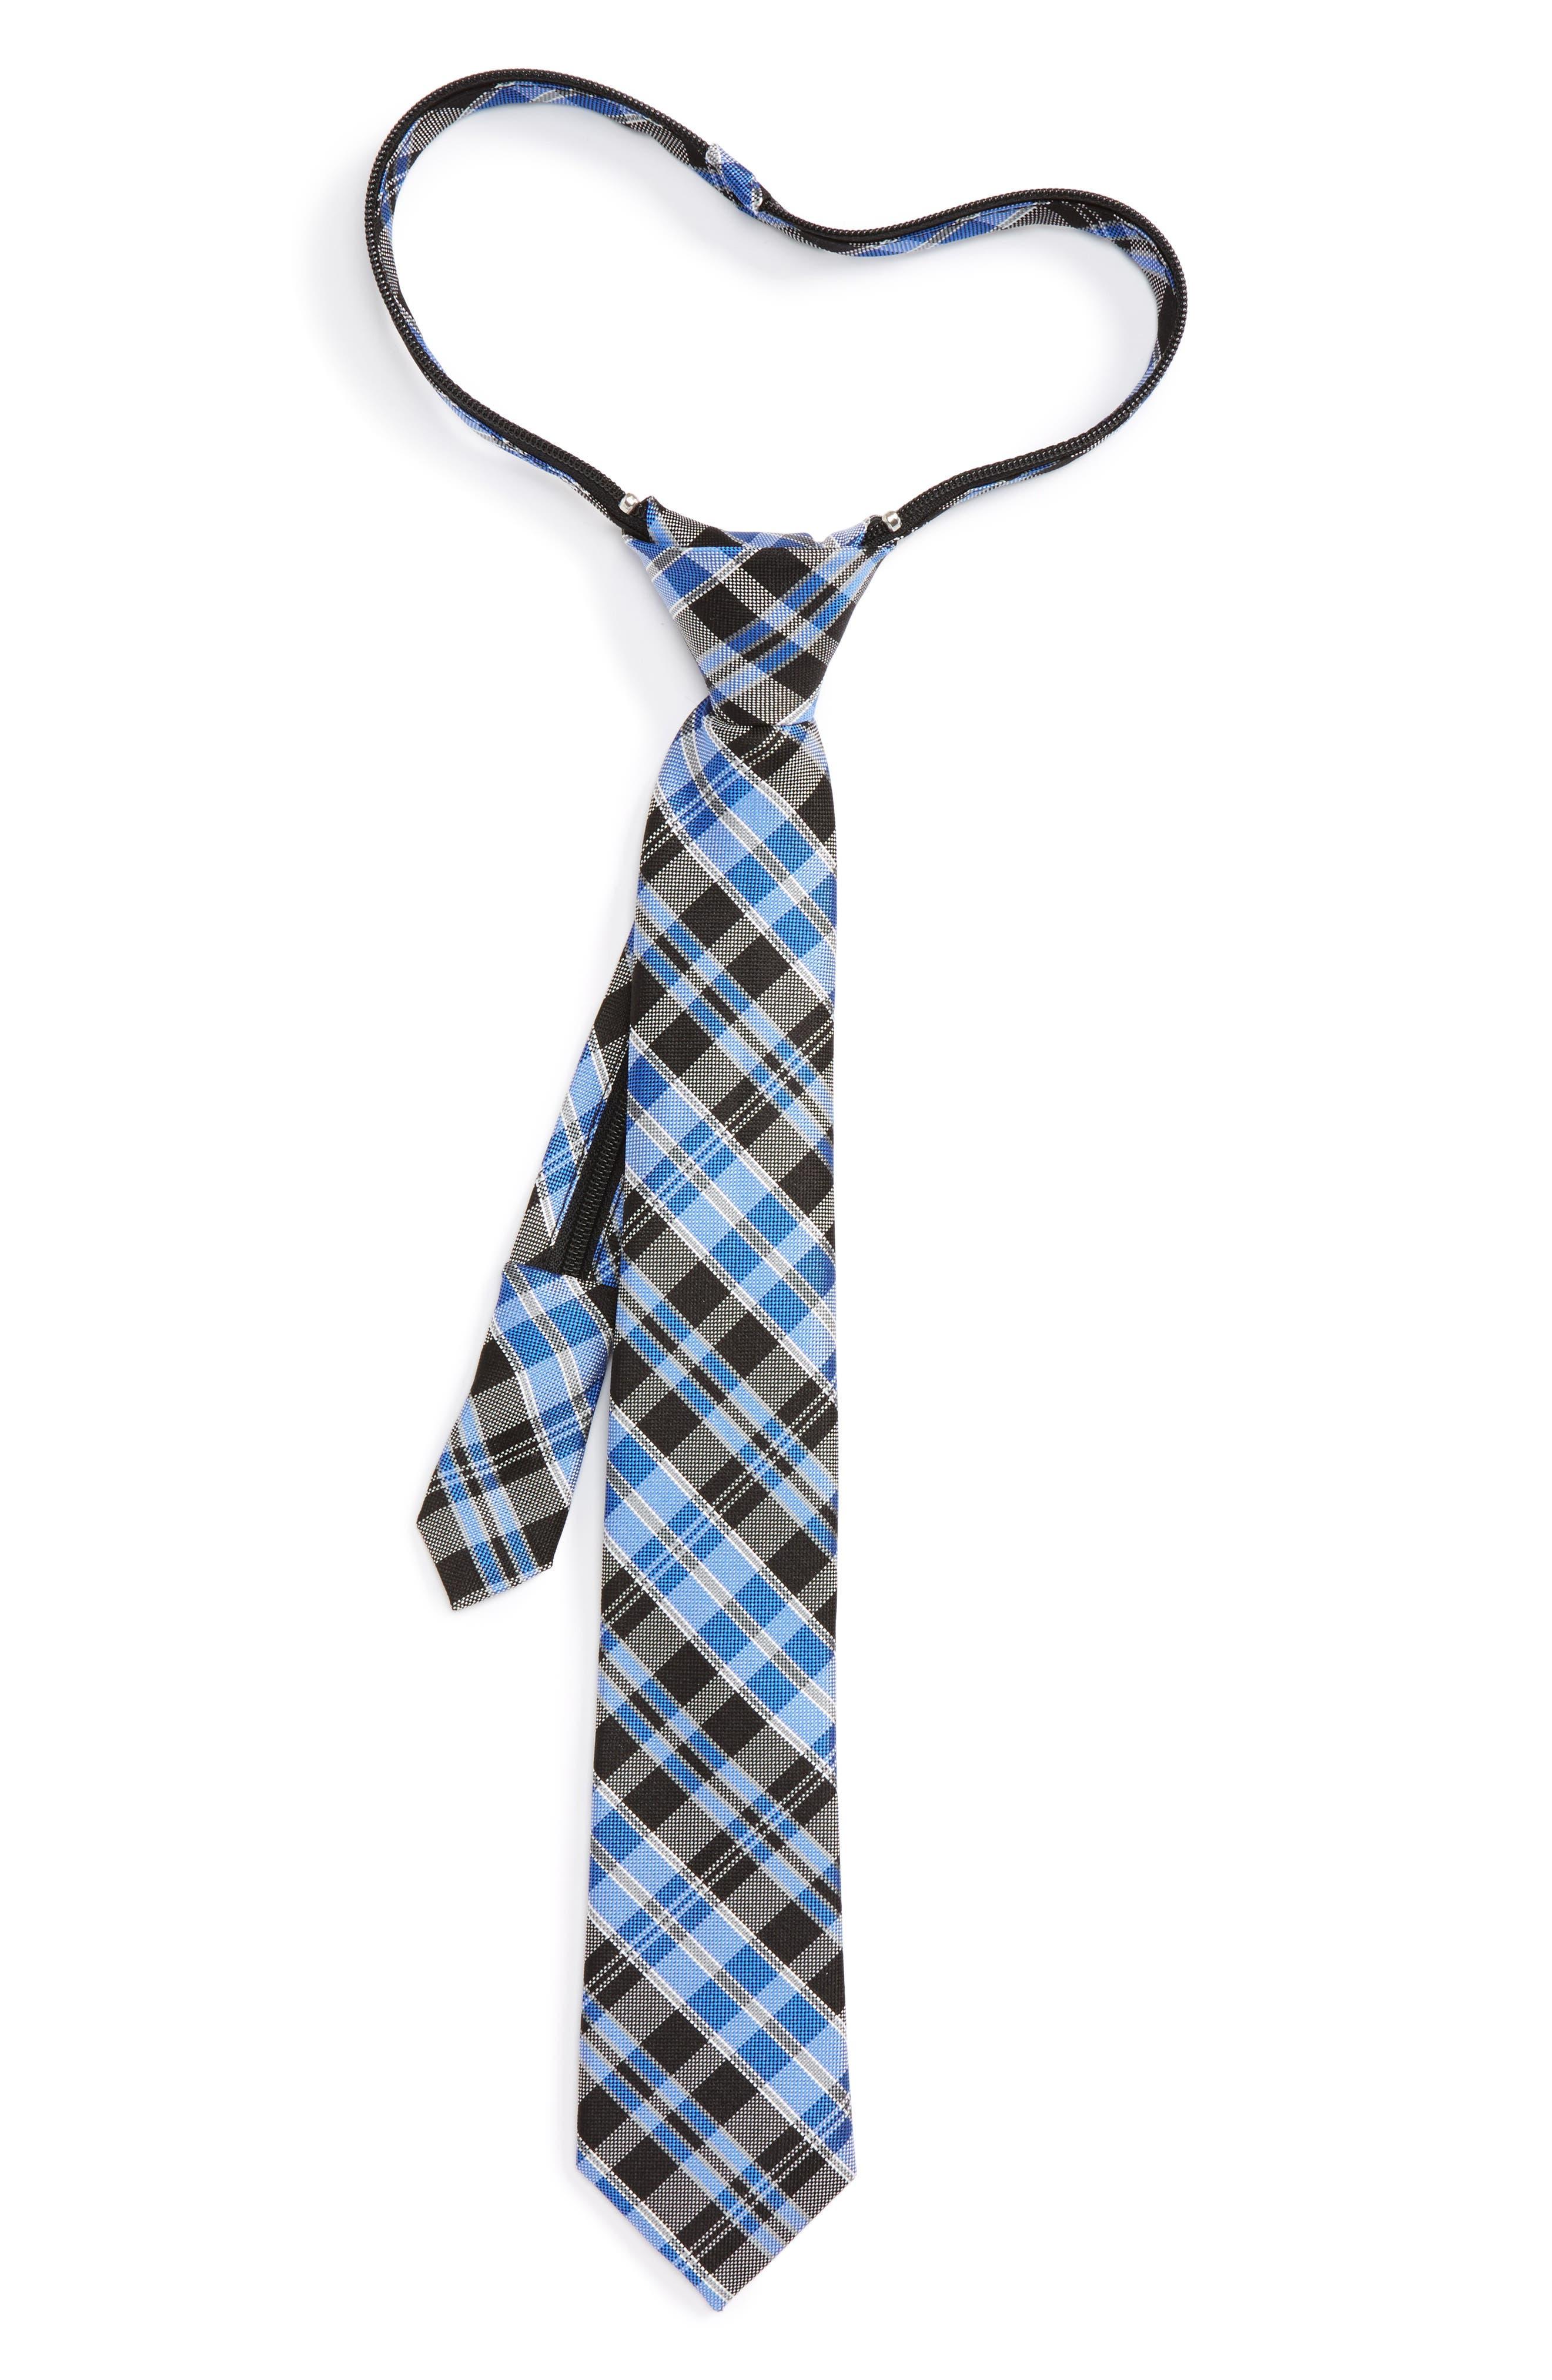 Plaid Silk Zip Tie,                             Main thumbnail 1, color,                             001